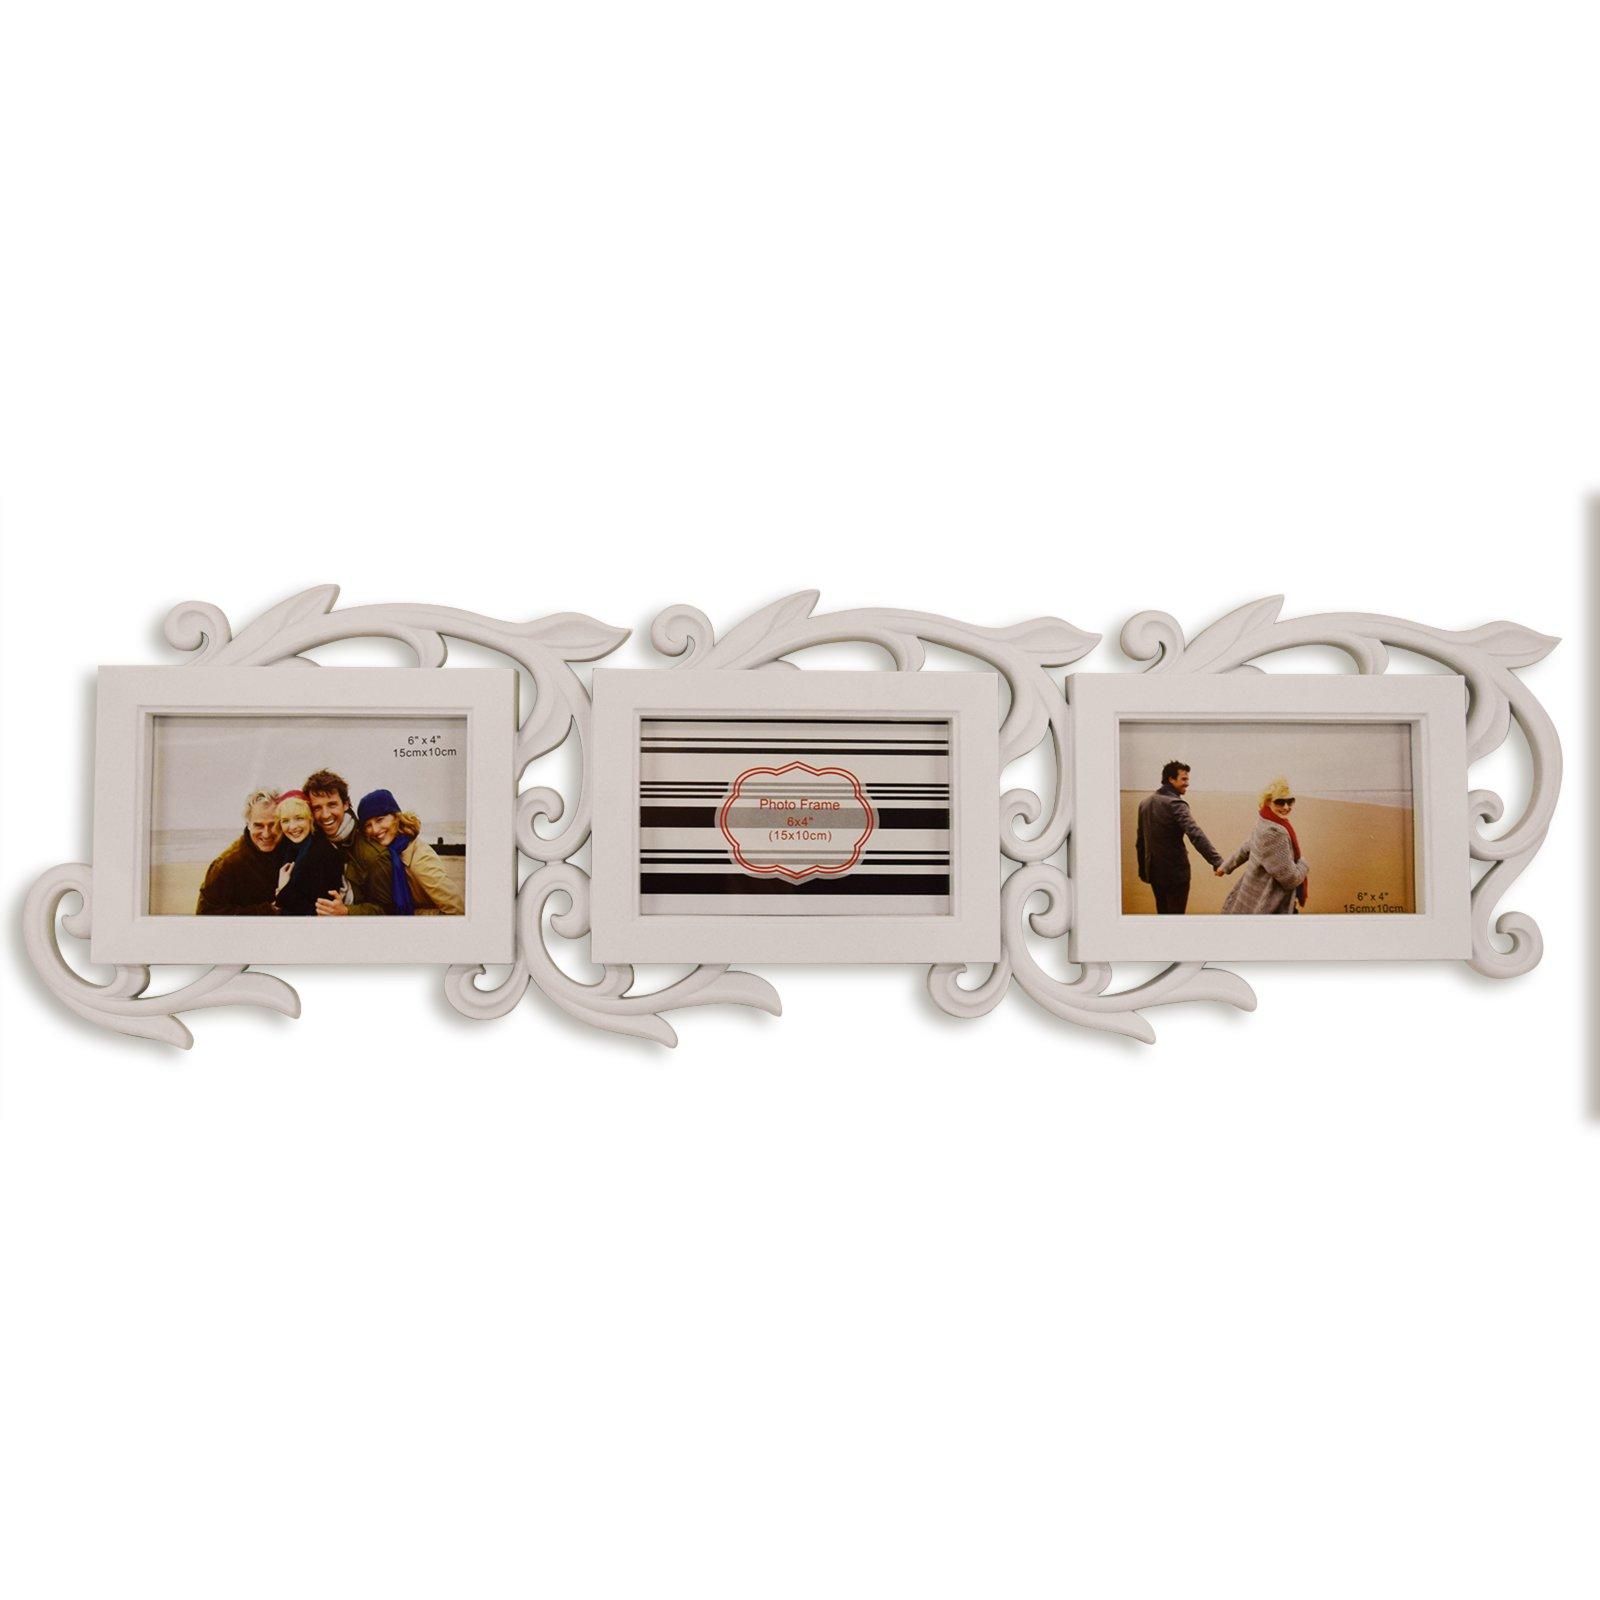 bilderrahmen wei f r 3 fotos bilderrahmen dekoration deko haushalt roller m belhaus. Black Bedroom Furniture Sets. Home Design Ideas